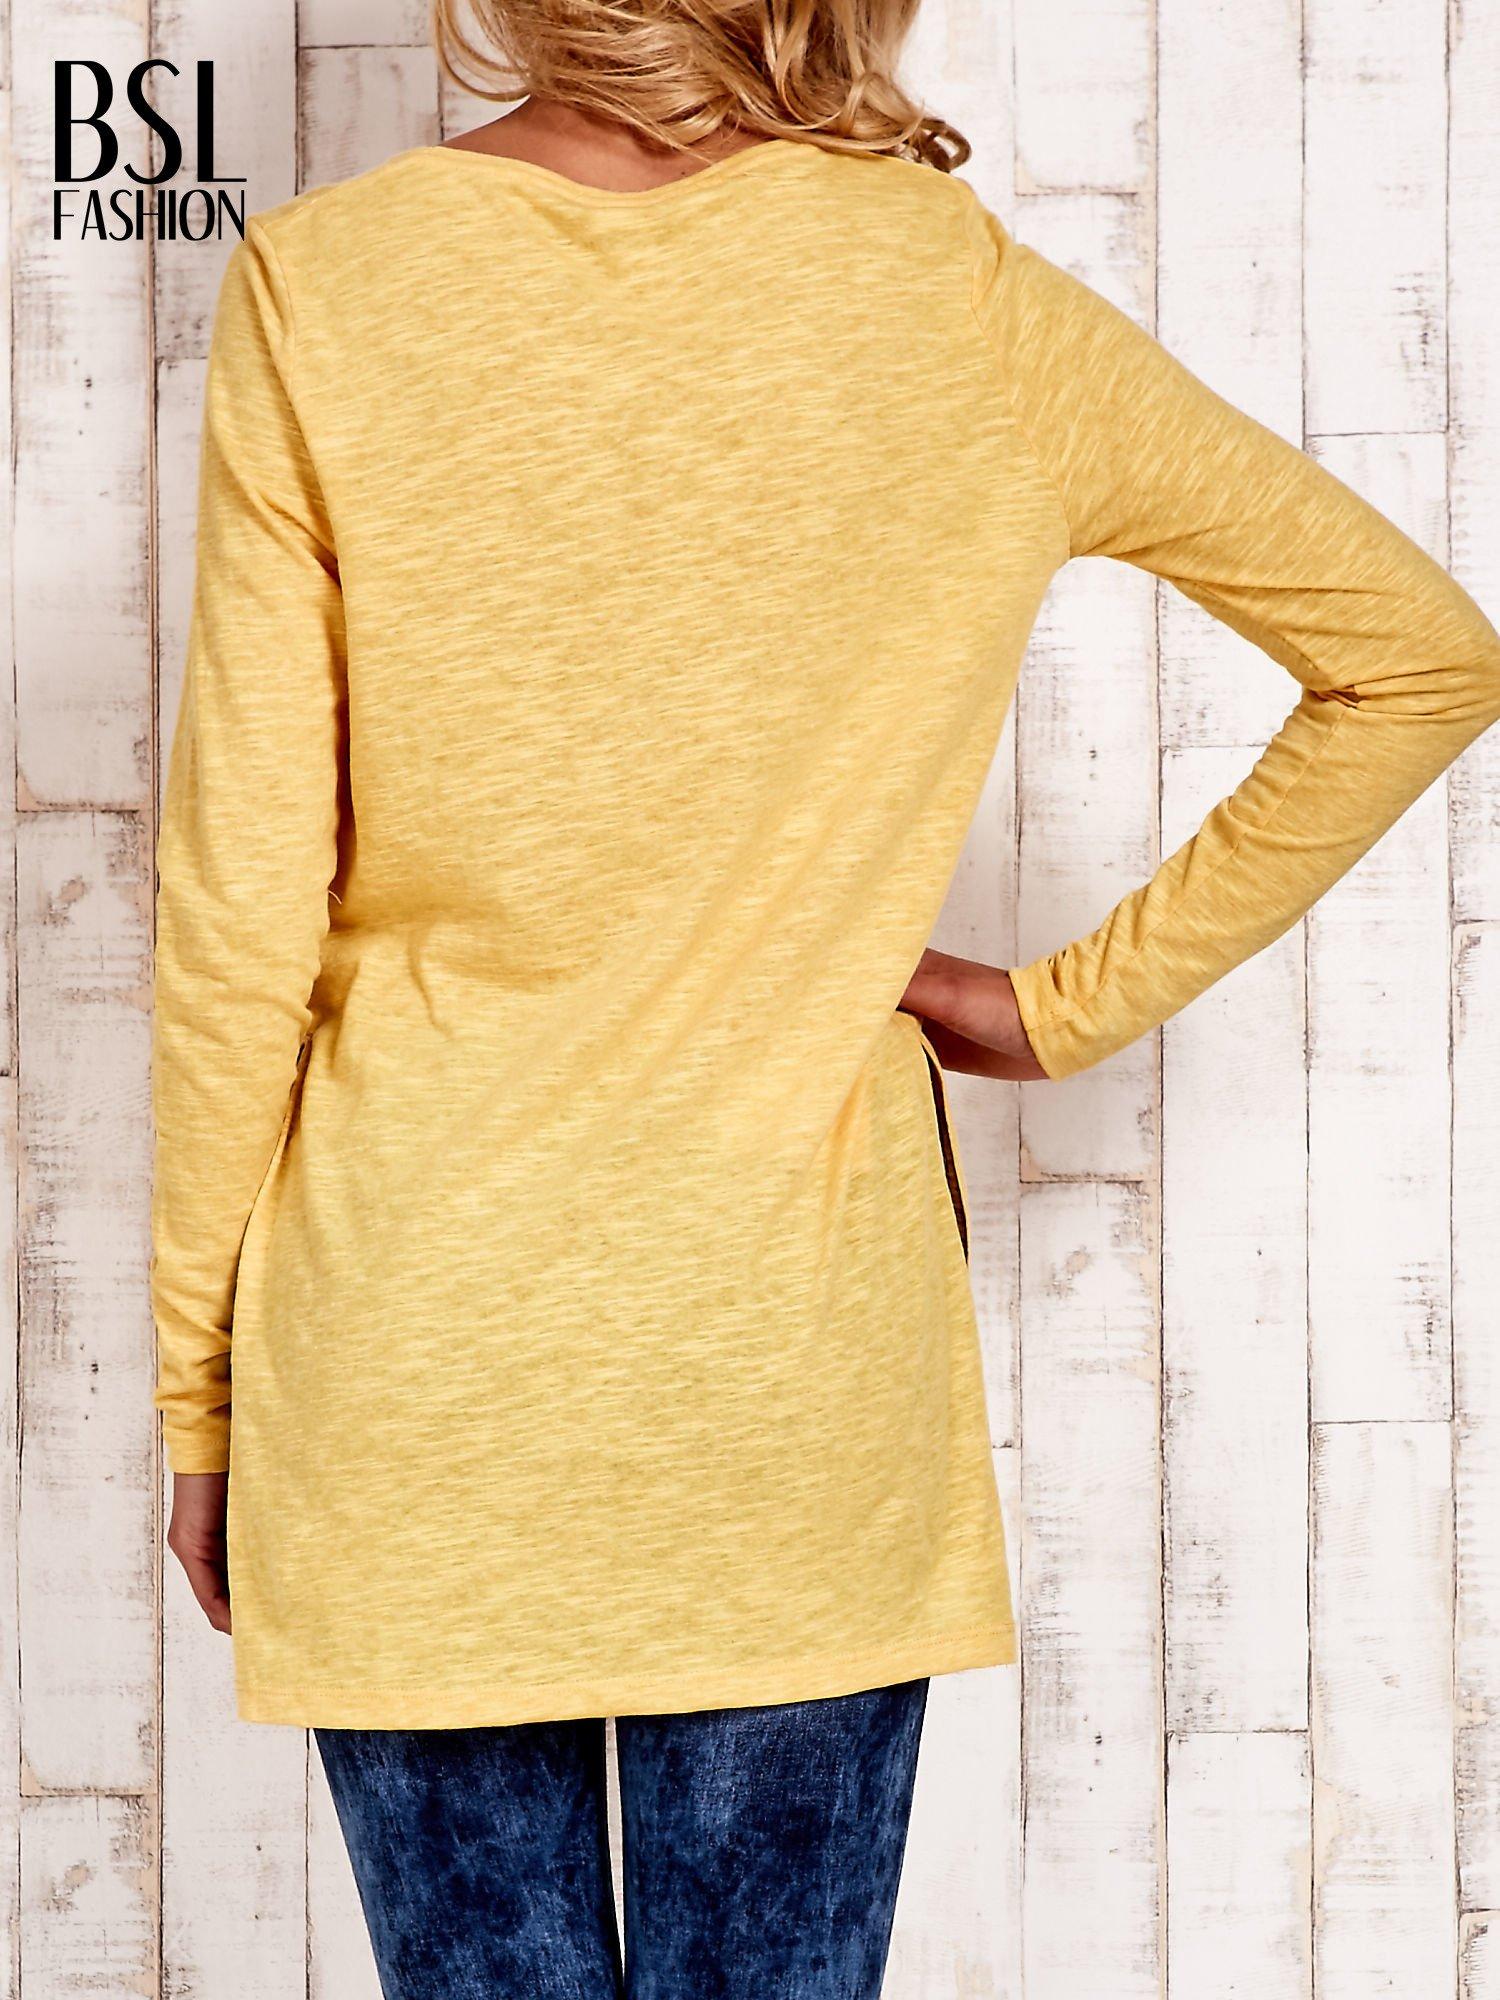 Żółta bluzka z rozporkami z boku                                  zdj.                                  4